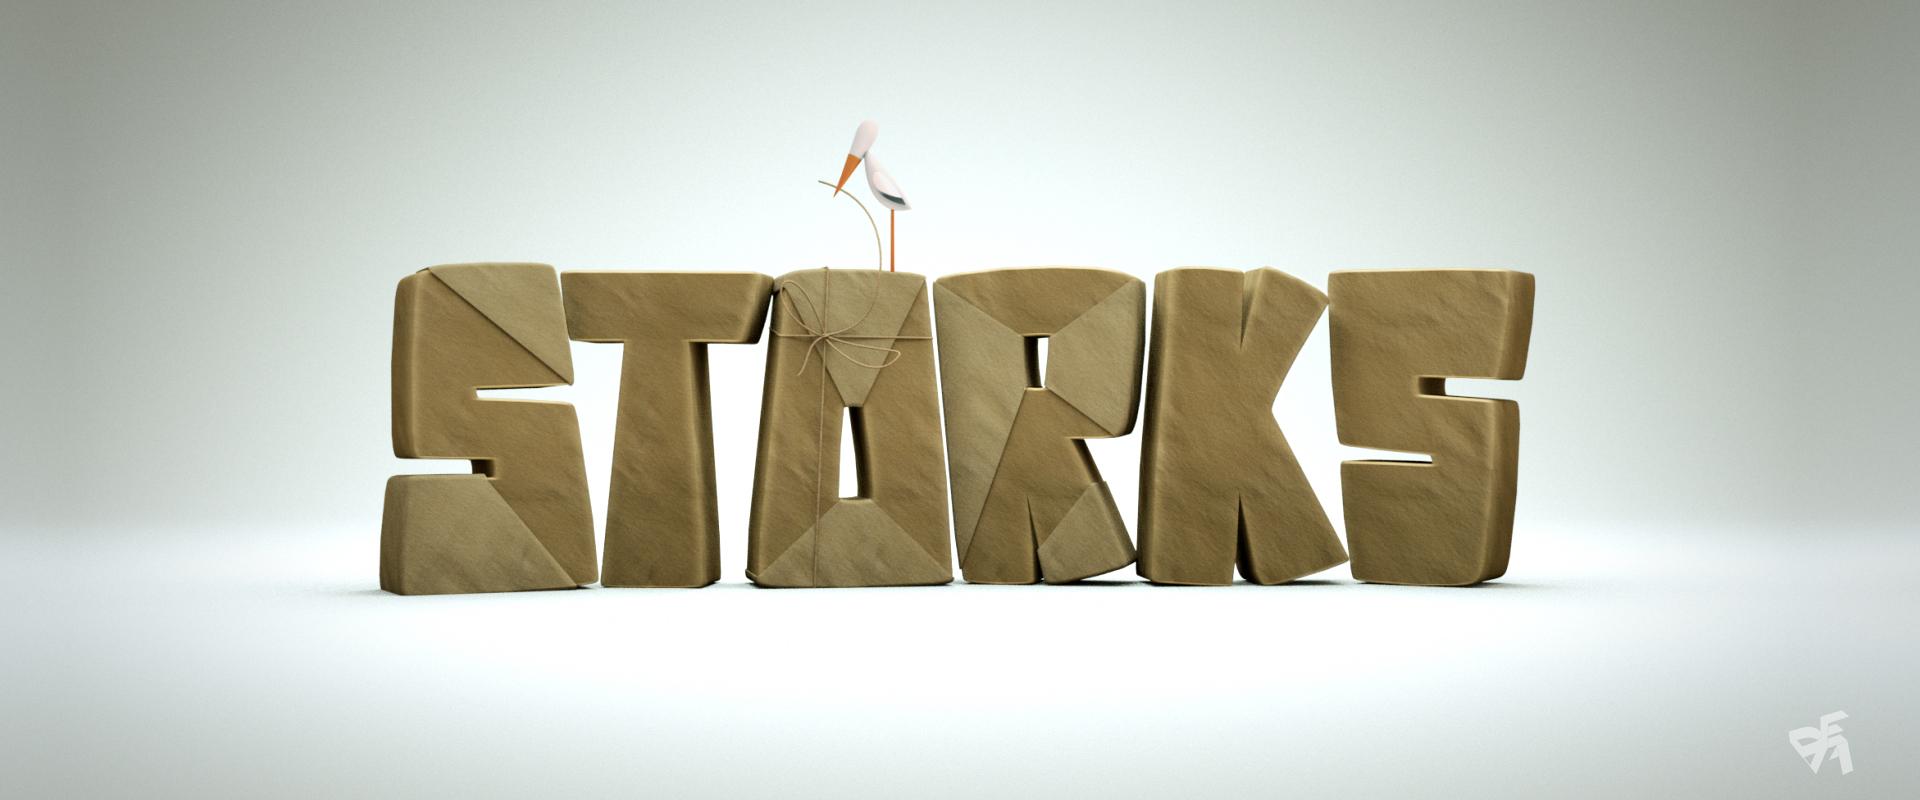 Storks-STYLEFRAME_03.jpg